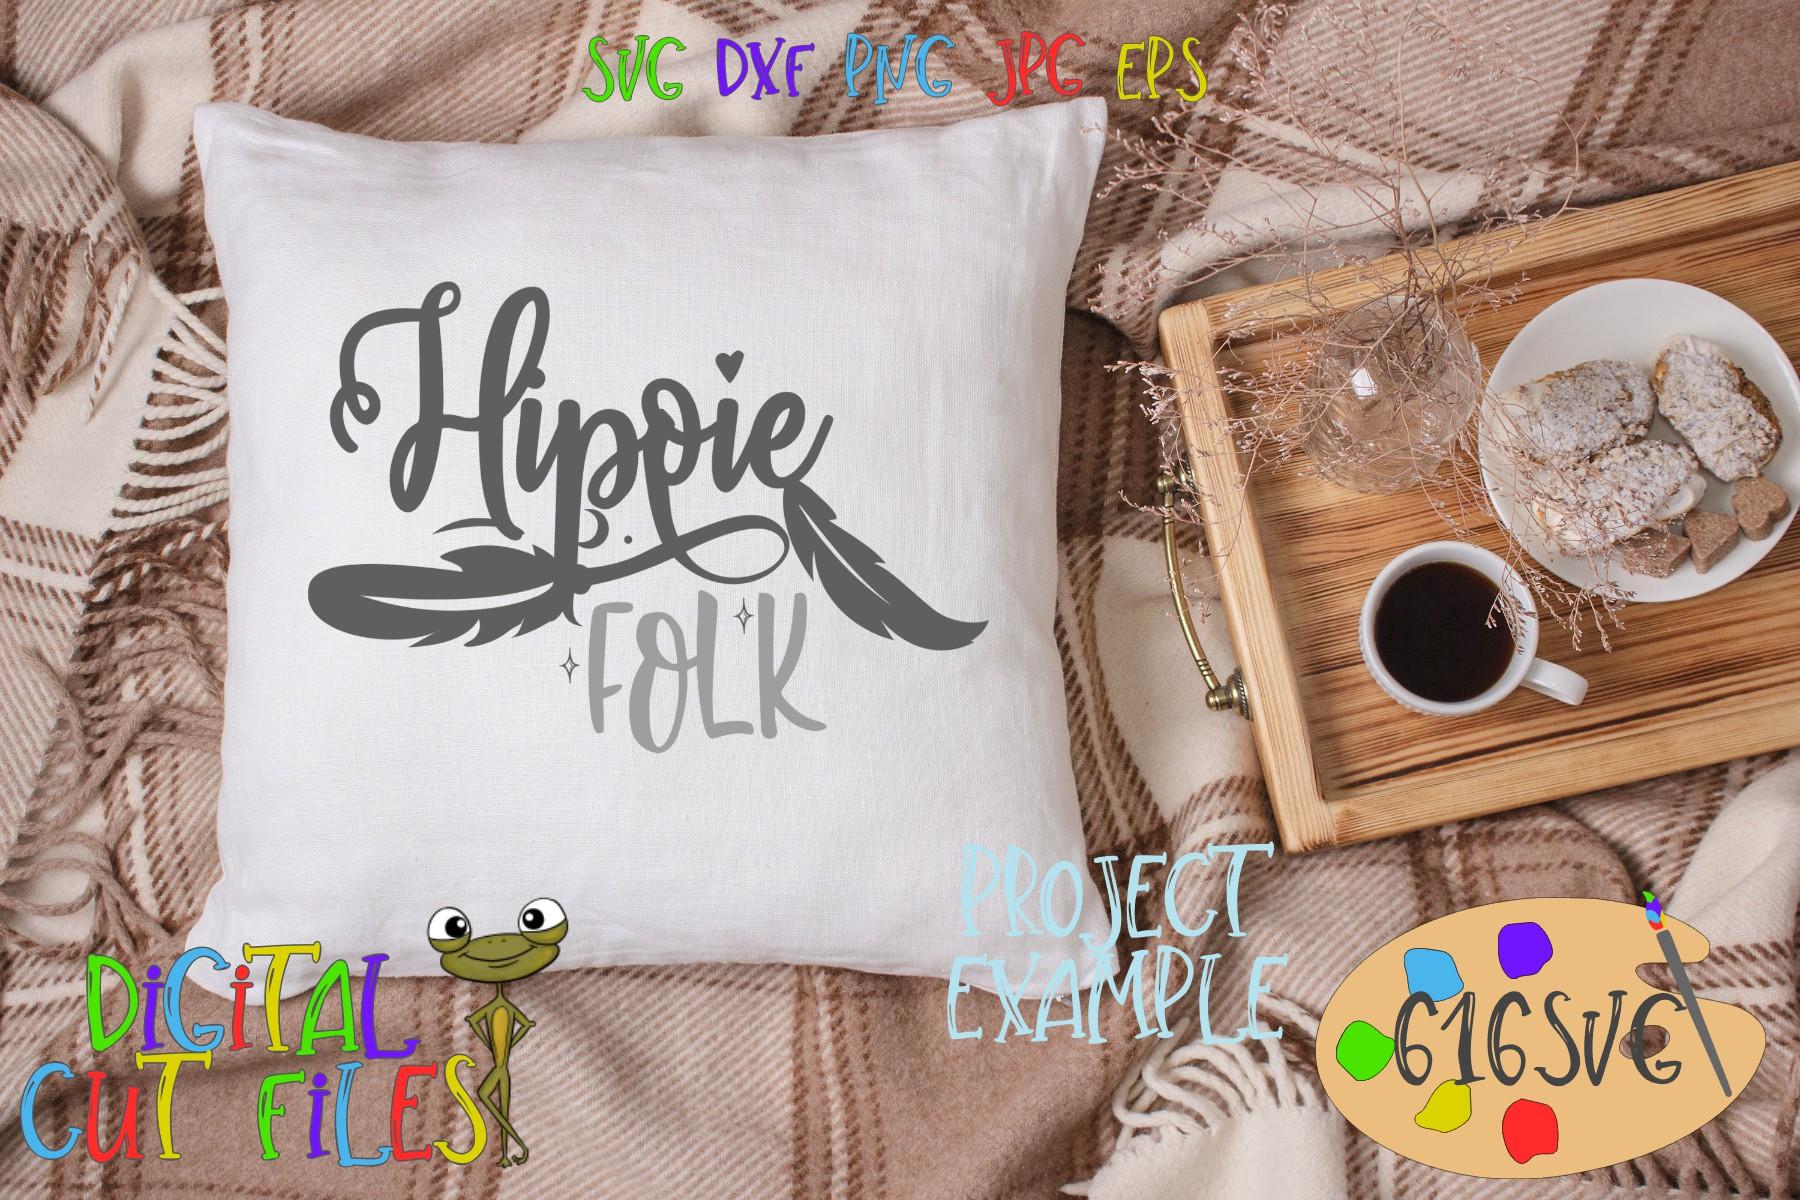 Hippie Folk SVG example image 1